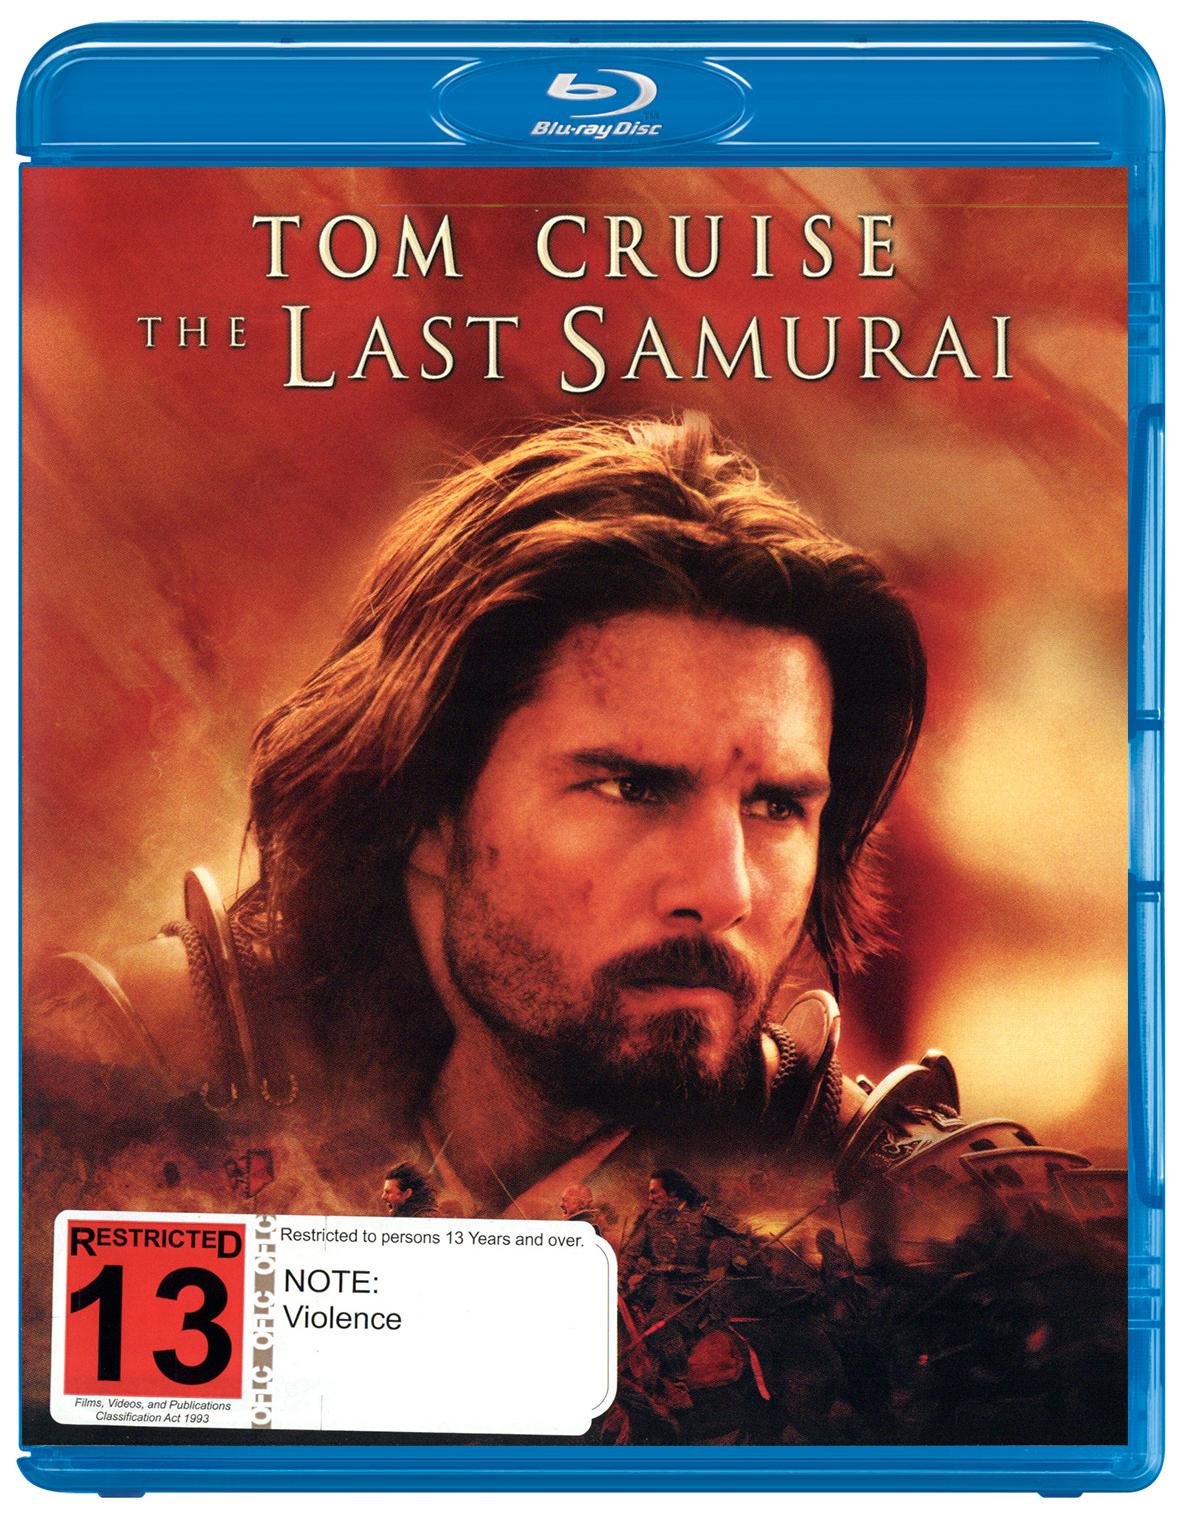 The Last Samurai on Blu-ray image